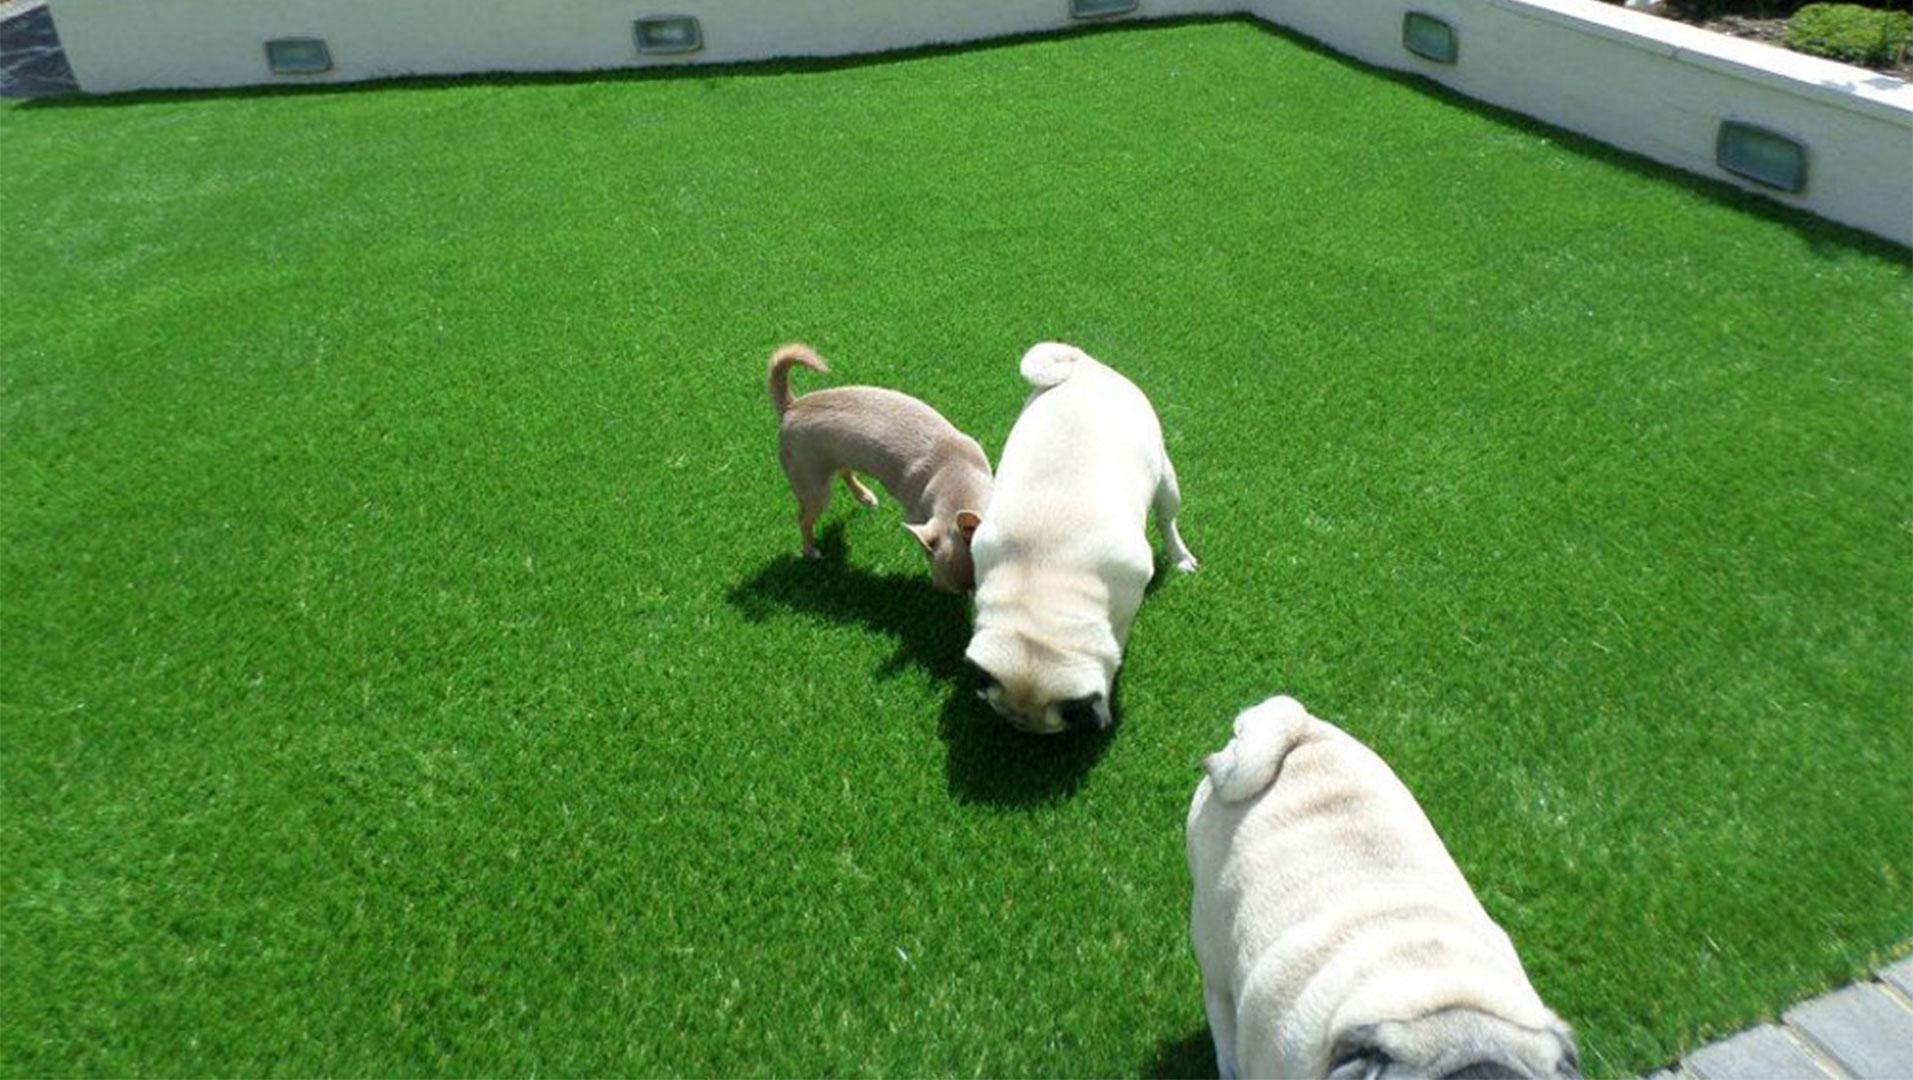 The Best Artificial Grass For Dogs Perfect Grass Ltd